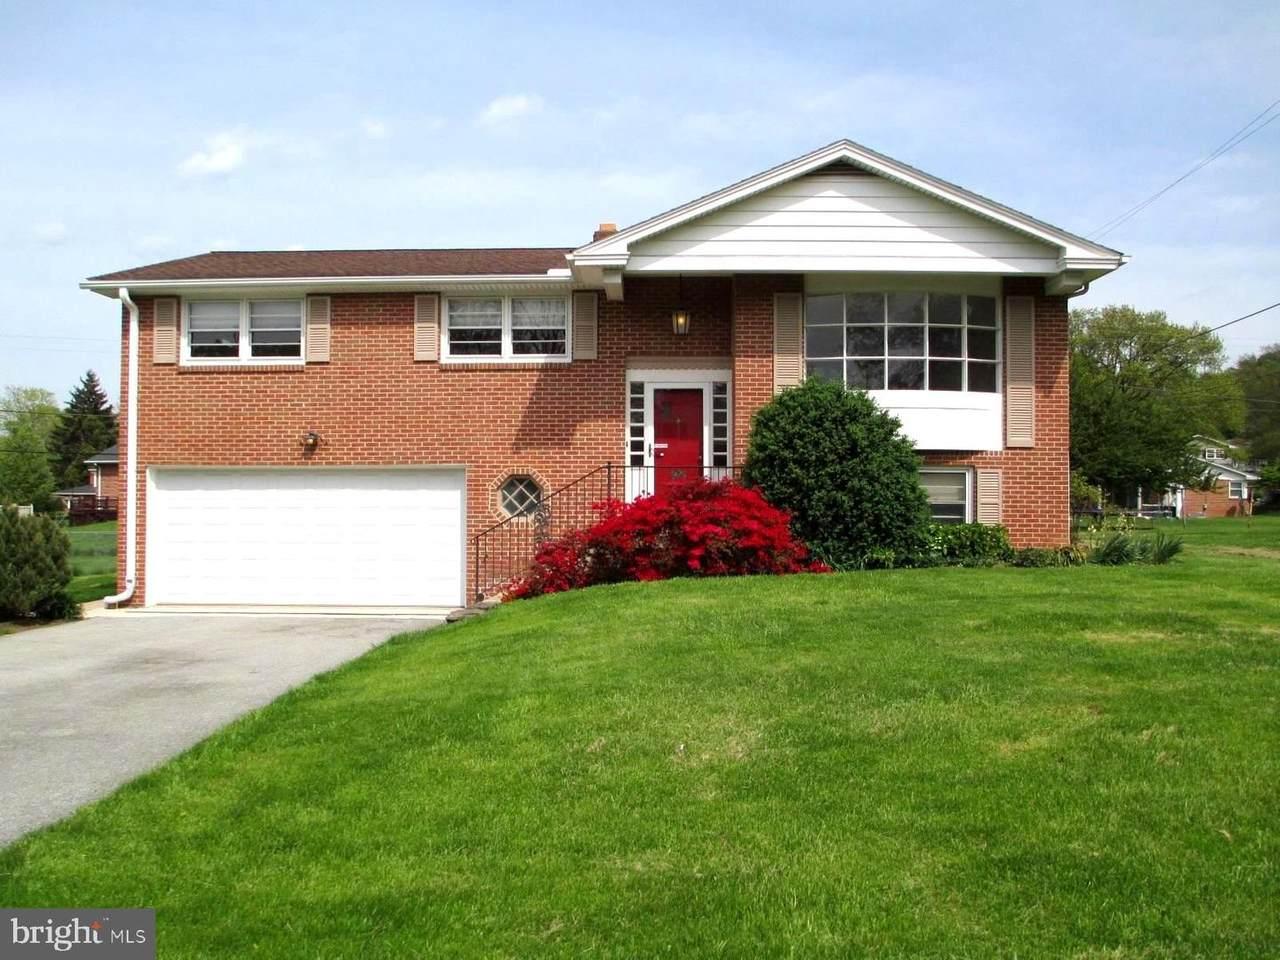 425 Cortleigh Drive - Photo 1